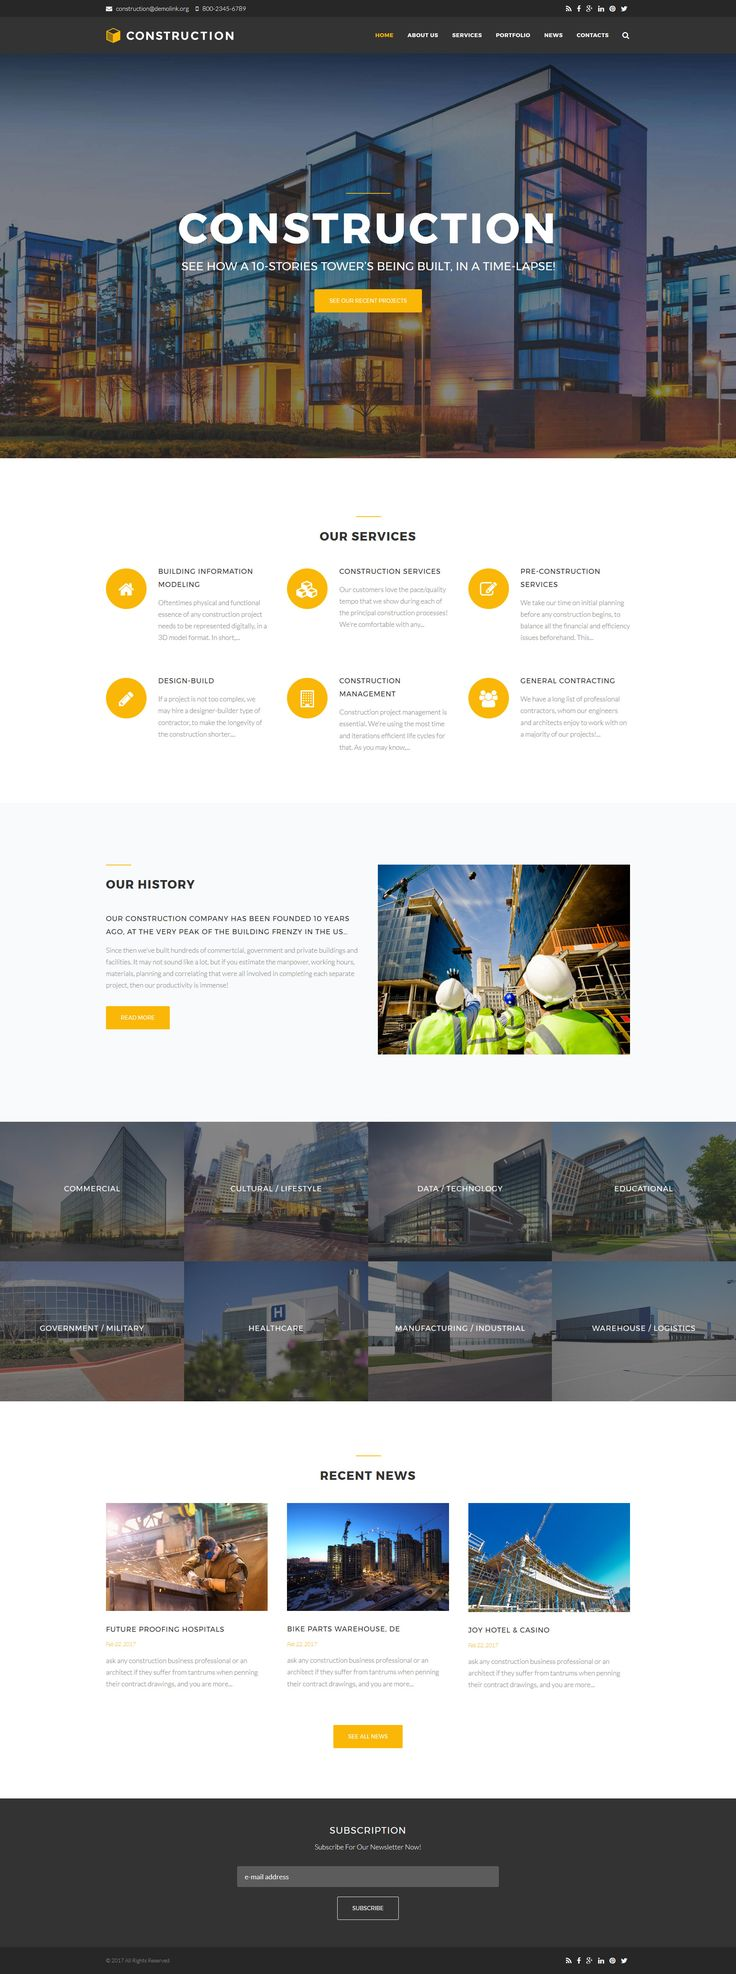 https://www.templatemonster.com/drupal-themes/construction-company-premium-drupal-template-62481.html